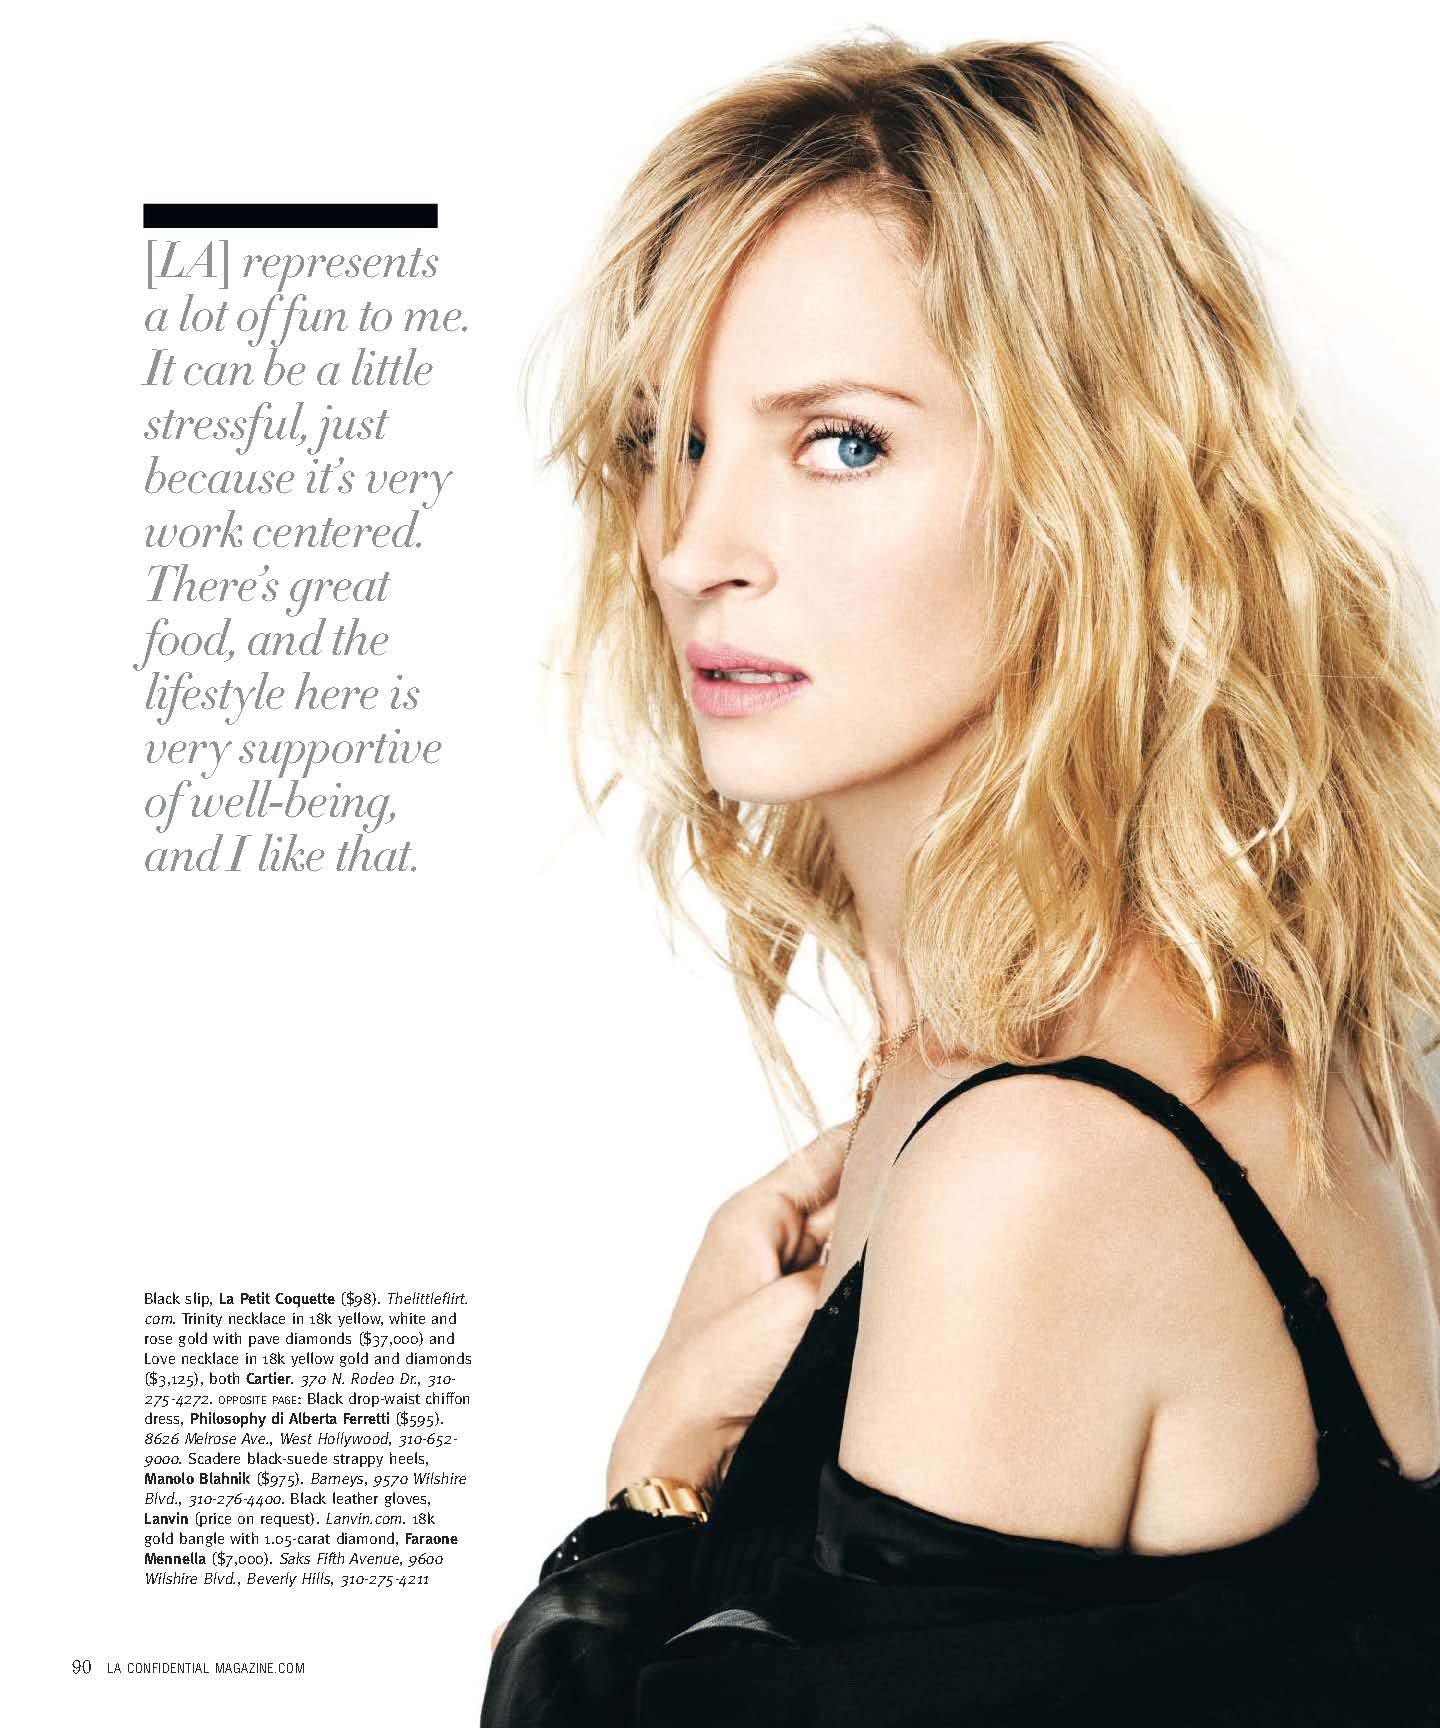 62618_septimiu-Uma_Thurman_in_Los_Angeles_Confidential_Magazine_845_122_1176lo.jpg